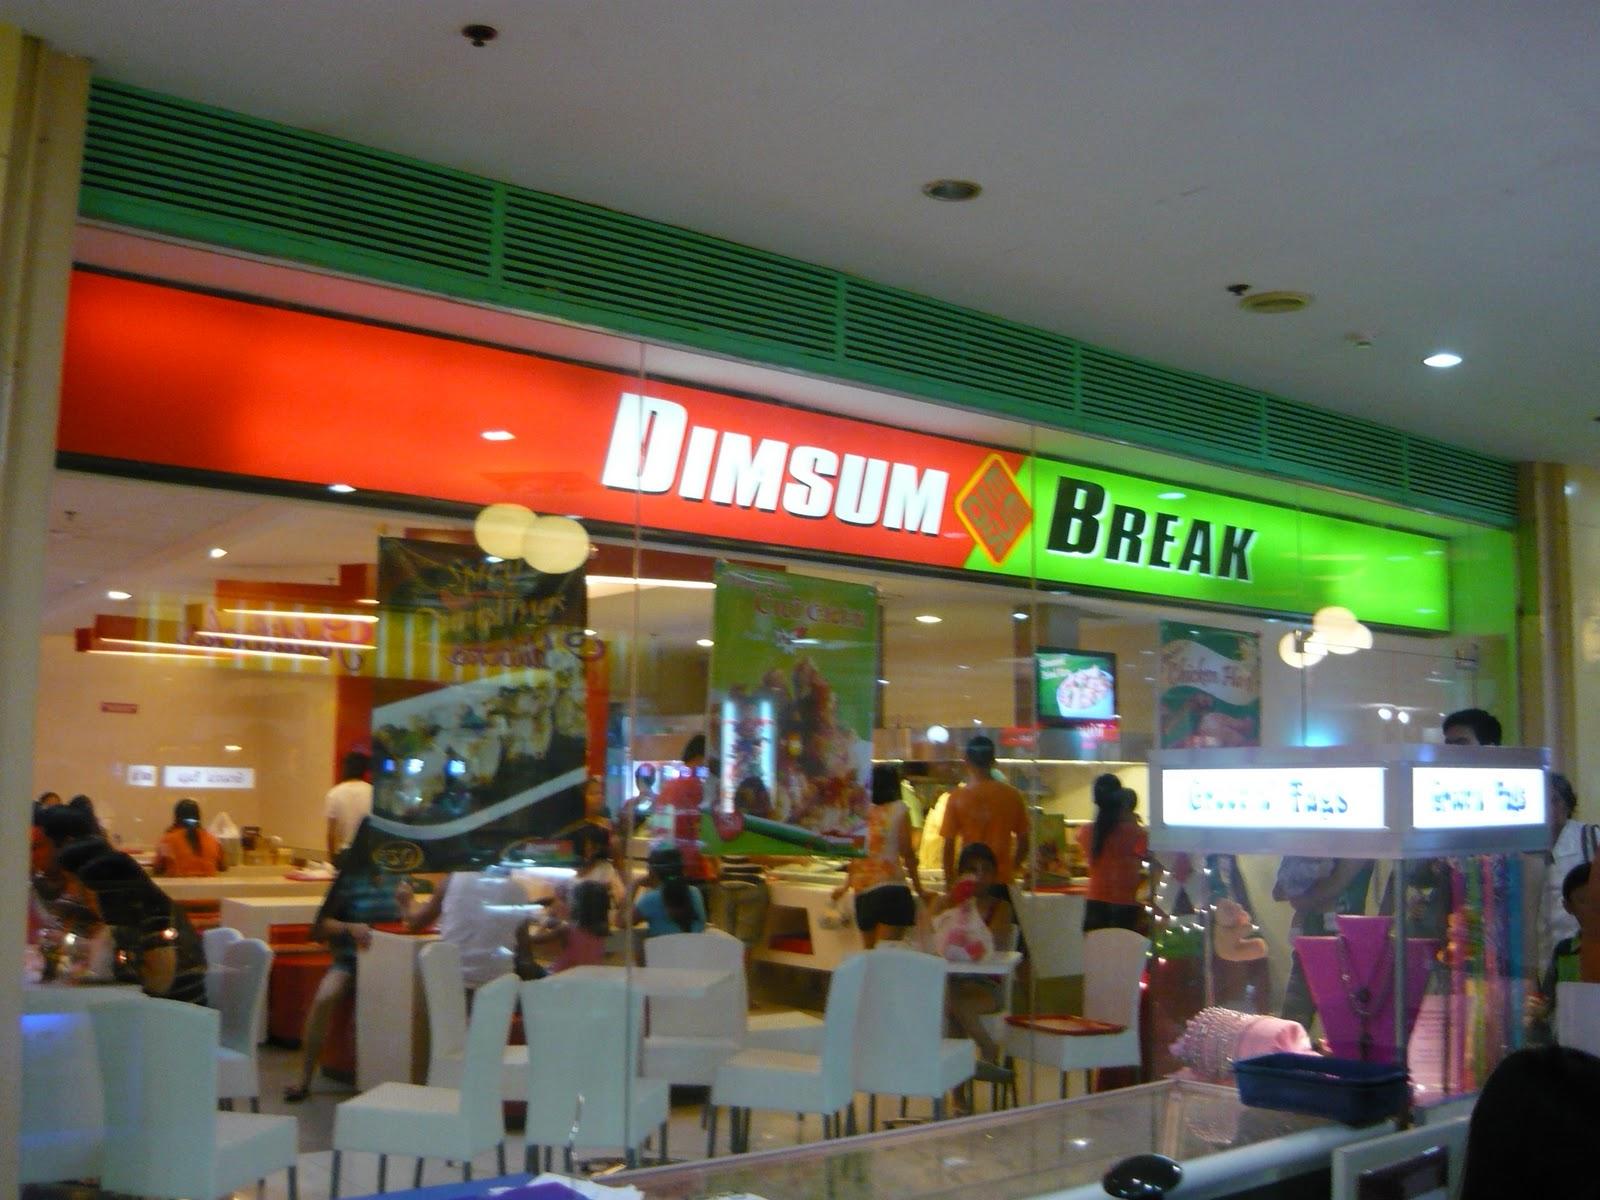 Dimsum Break - Food, Travel and Whatevs